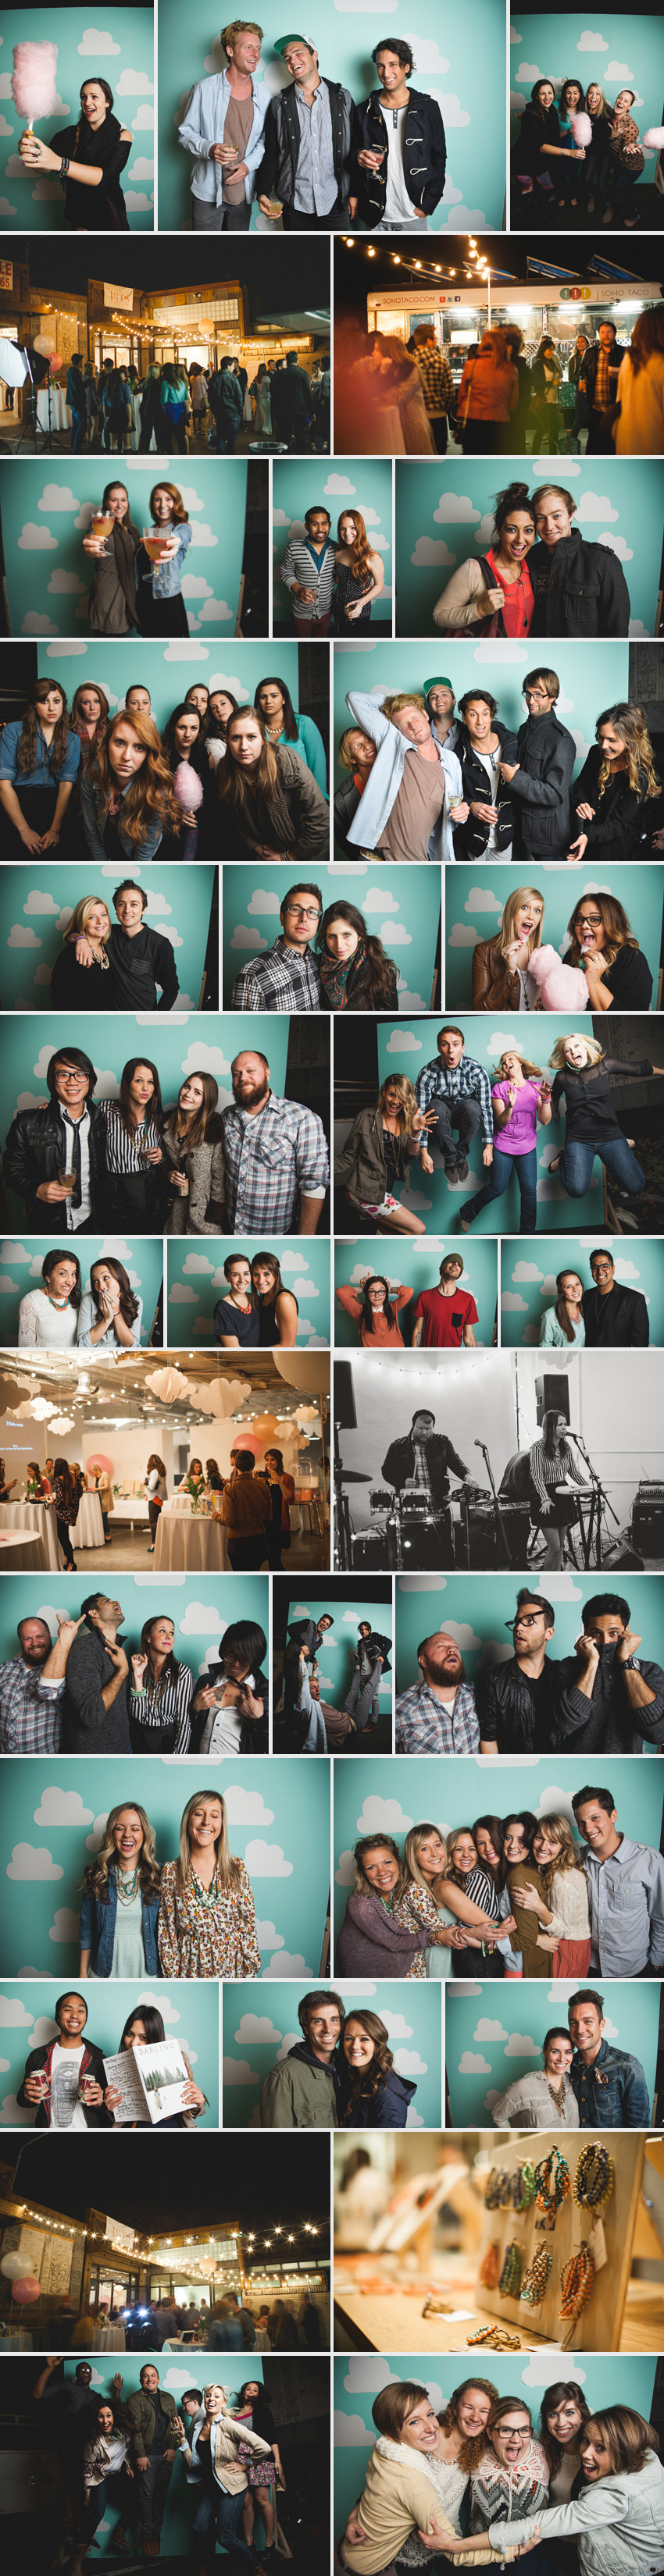 31bits2013springlaunch